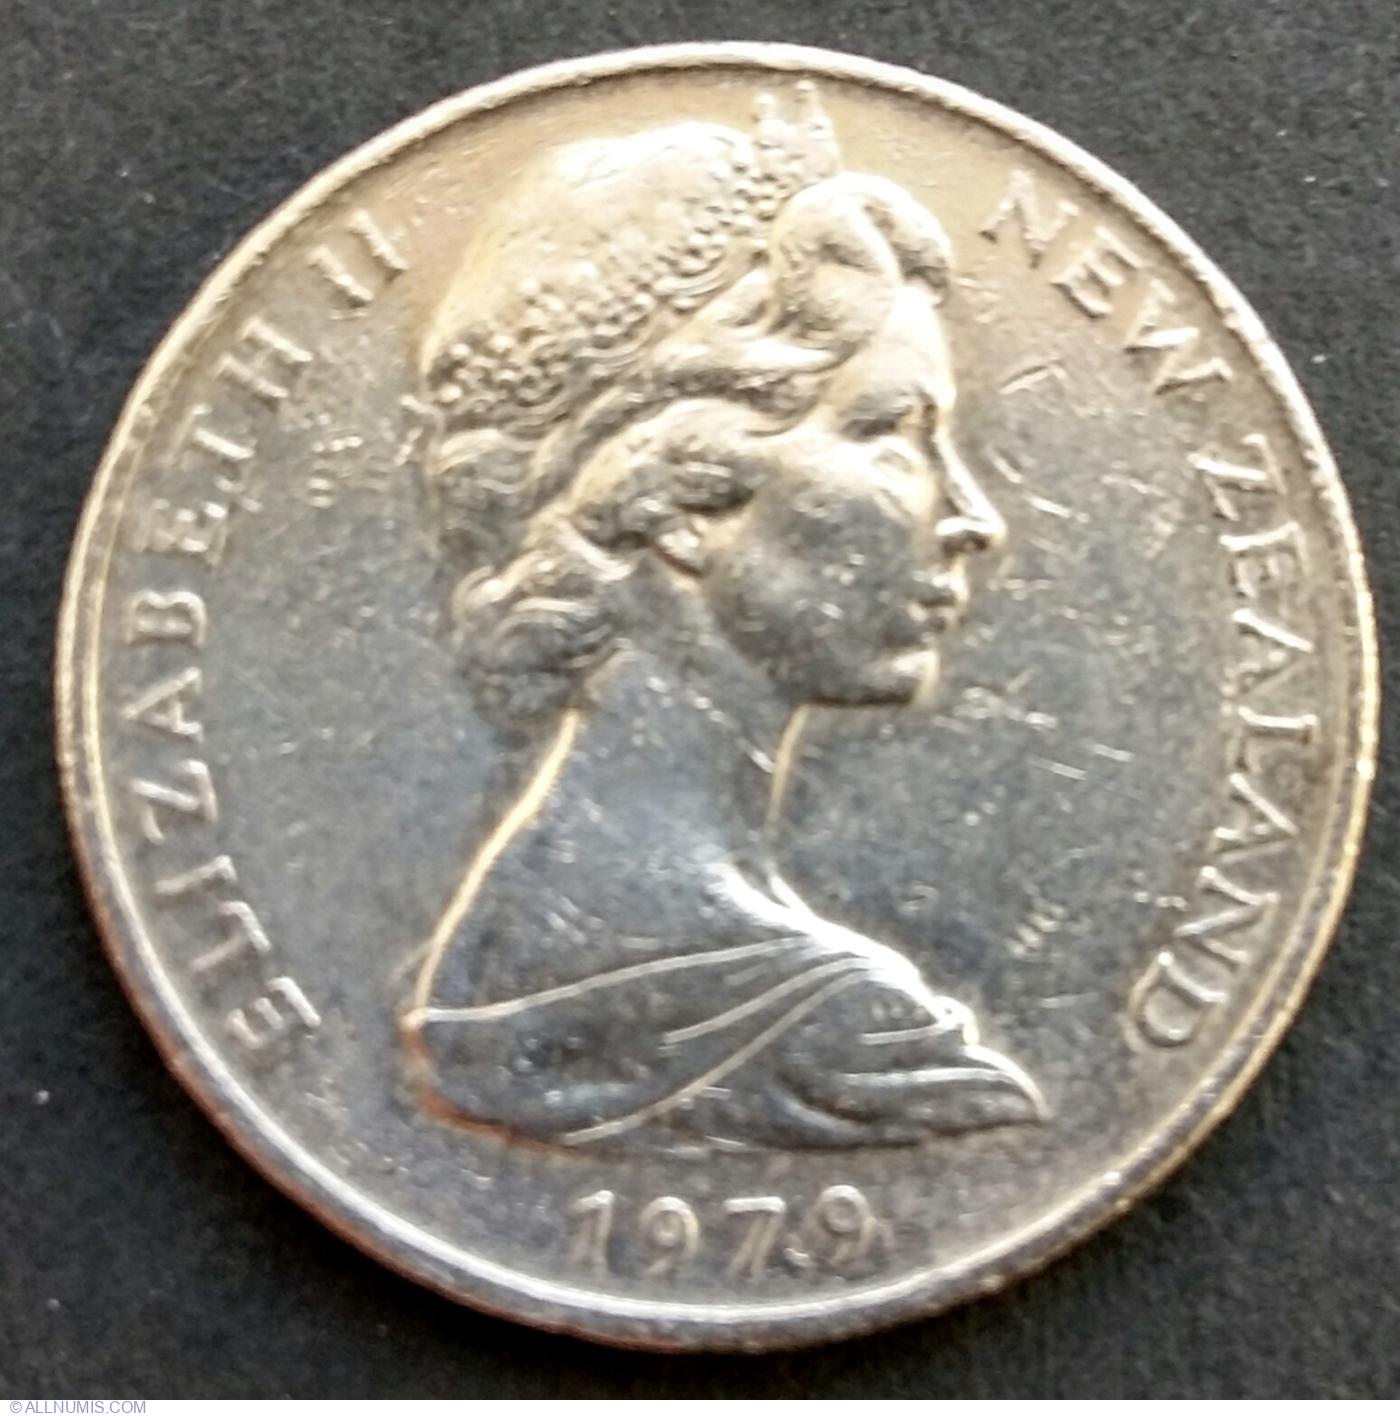 1979 20 cent unc coin